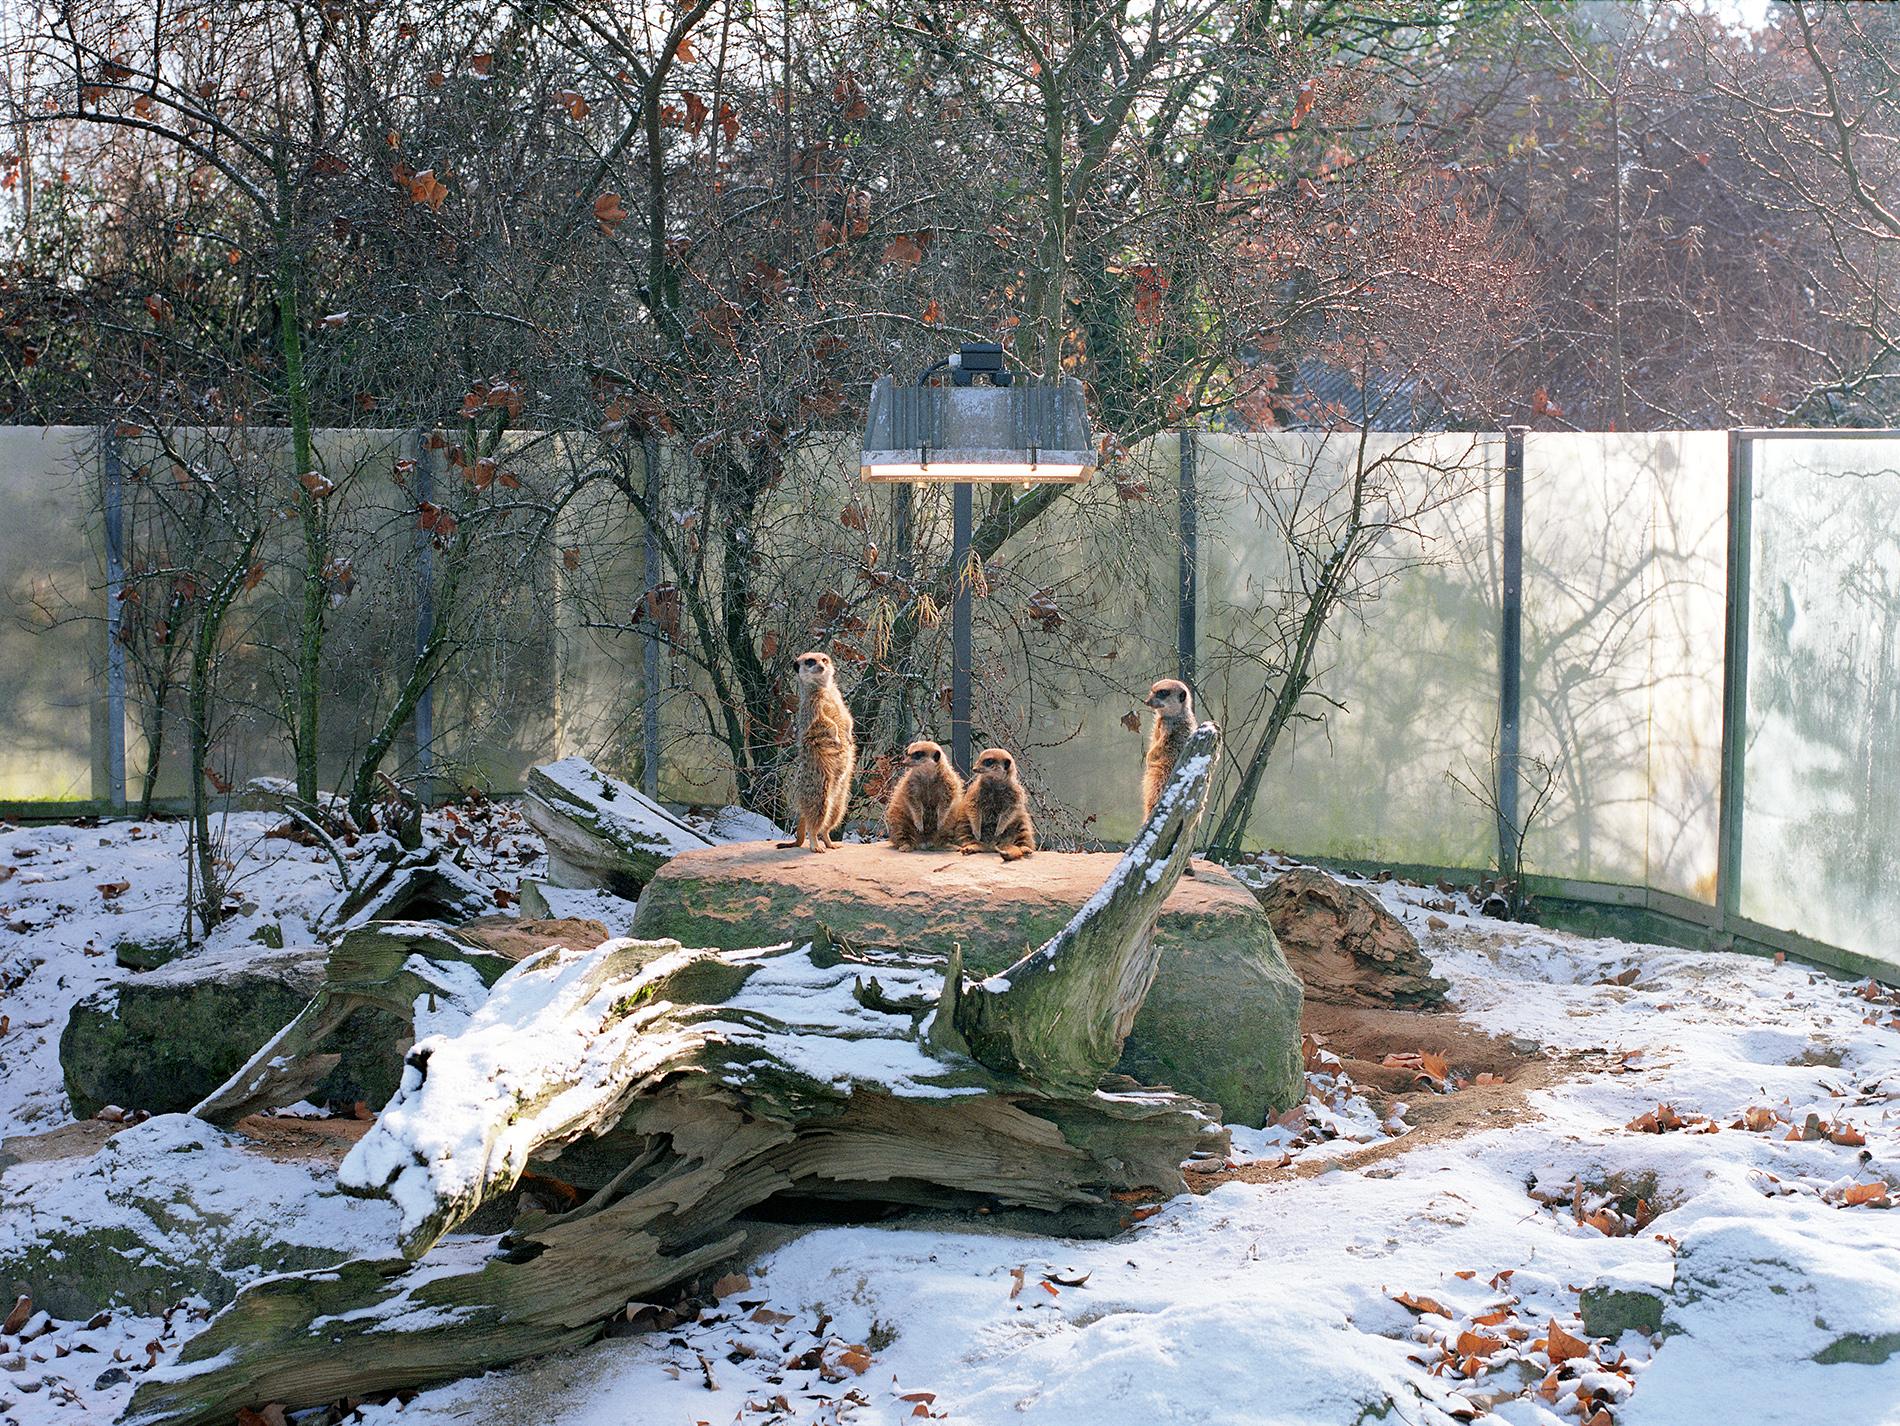 Meerkats at Stuttgat Zoo